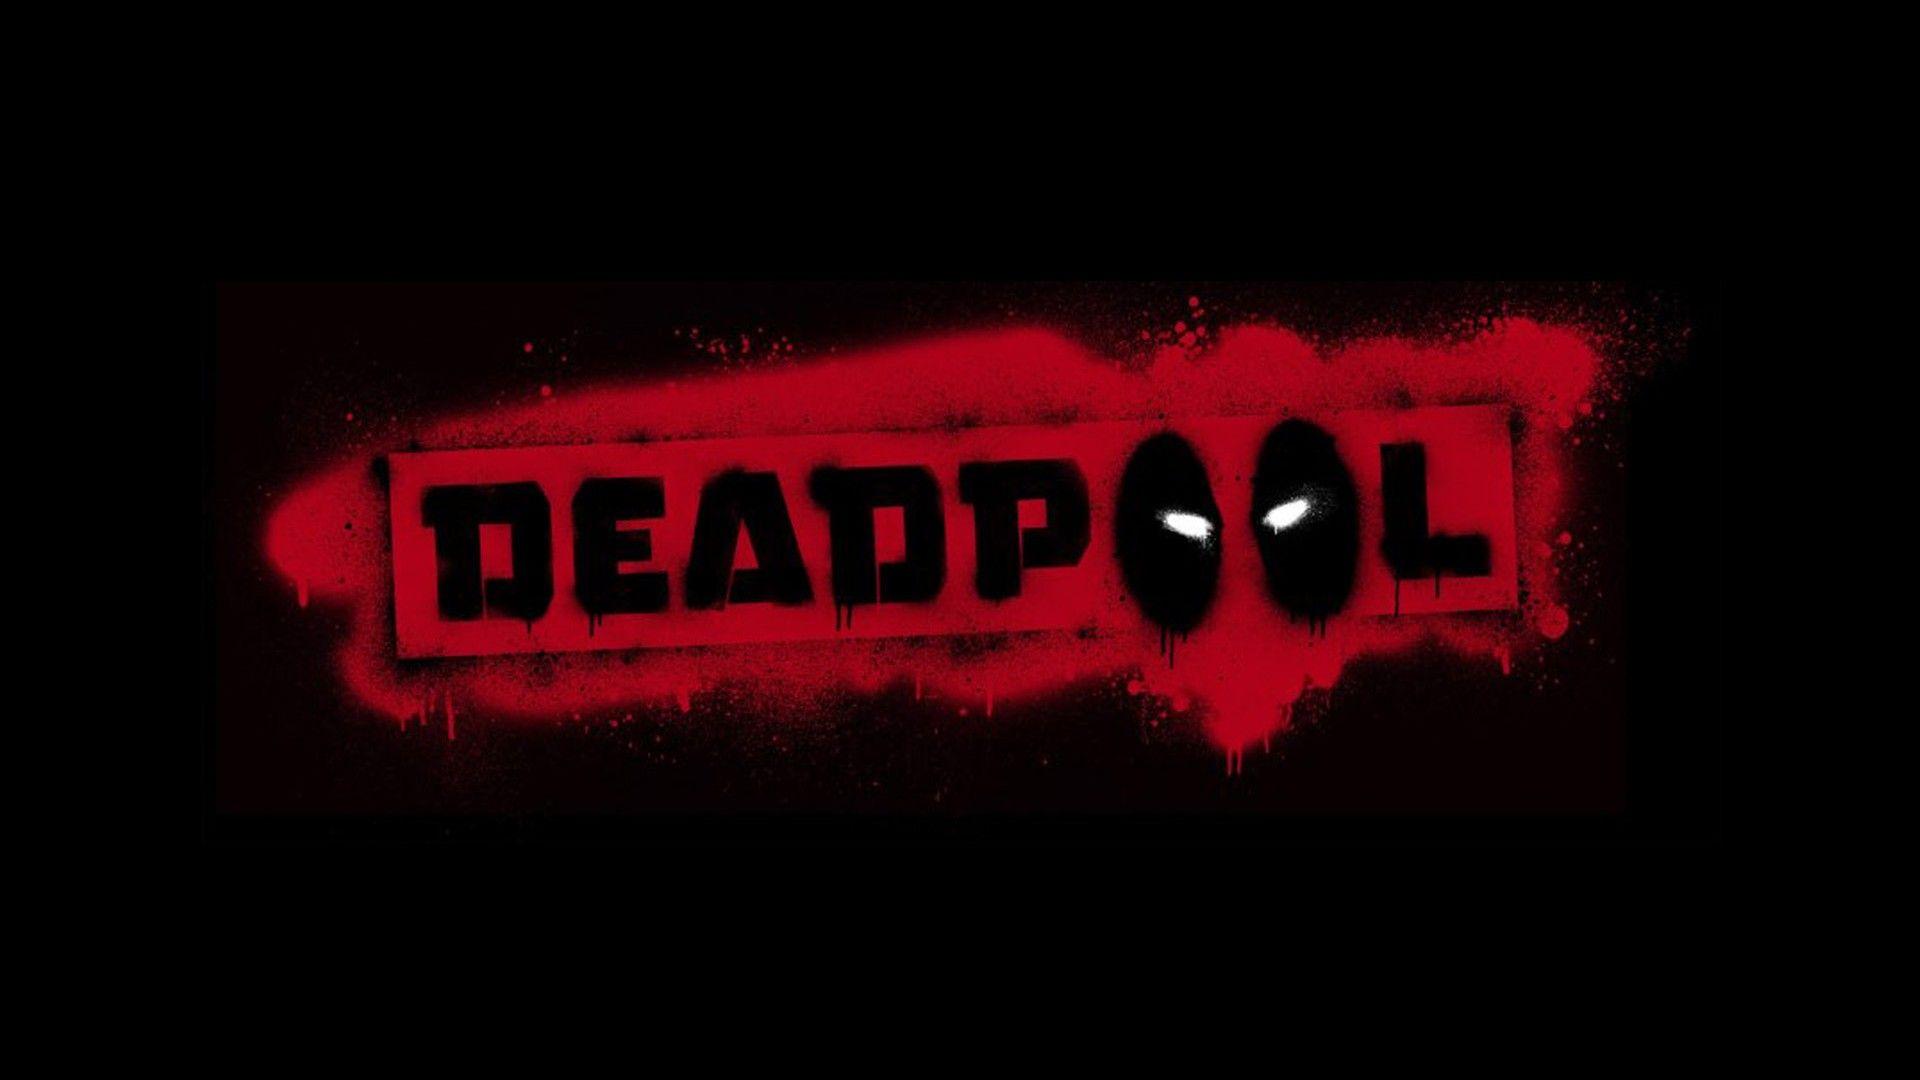 Deadpool Logo Wallpapers High Quality Deadpool Deadpool